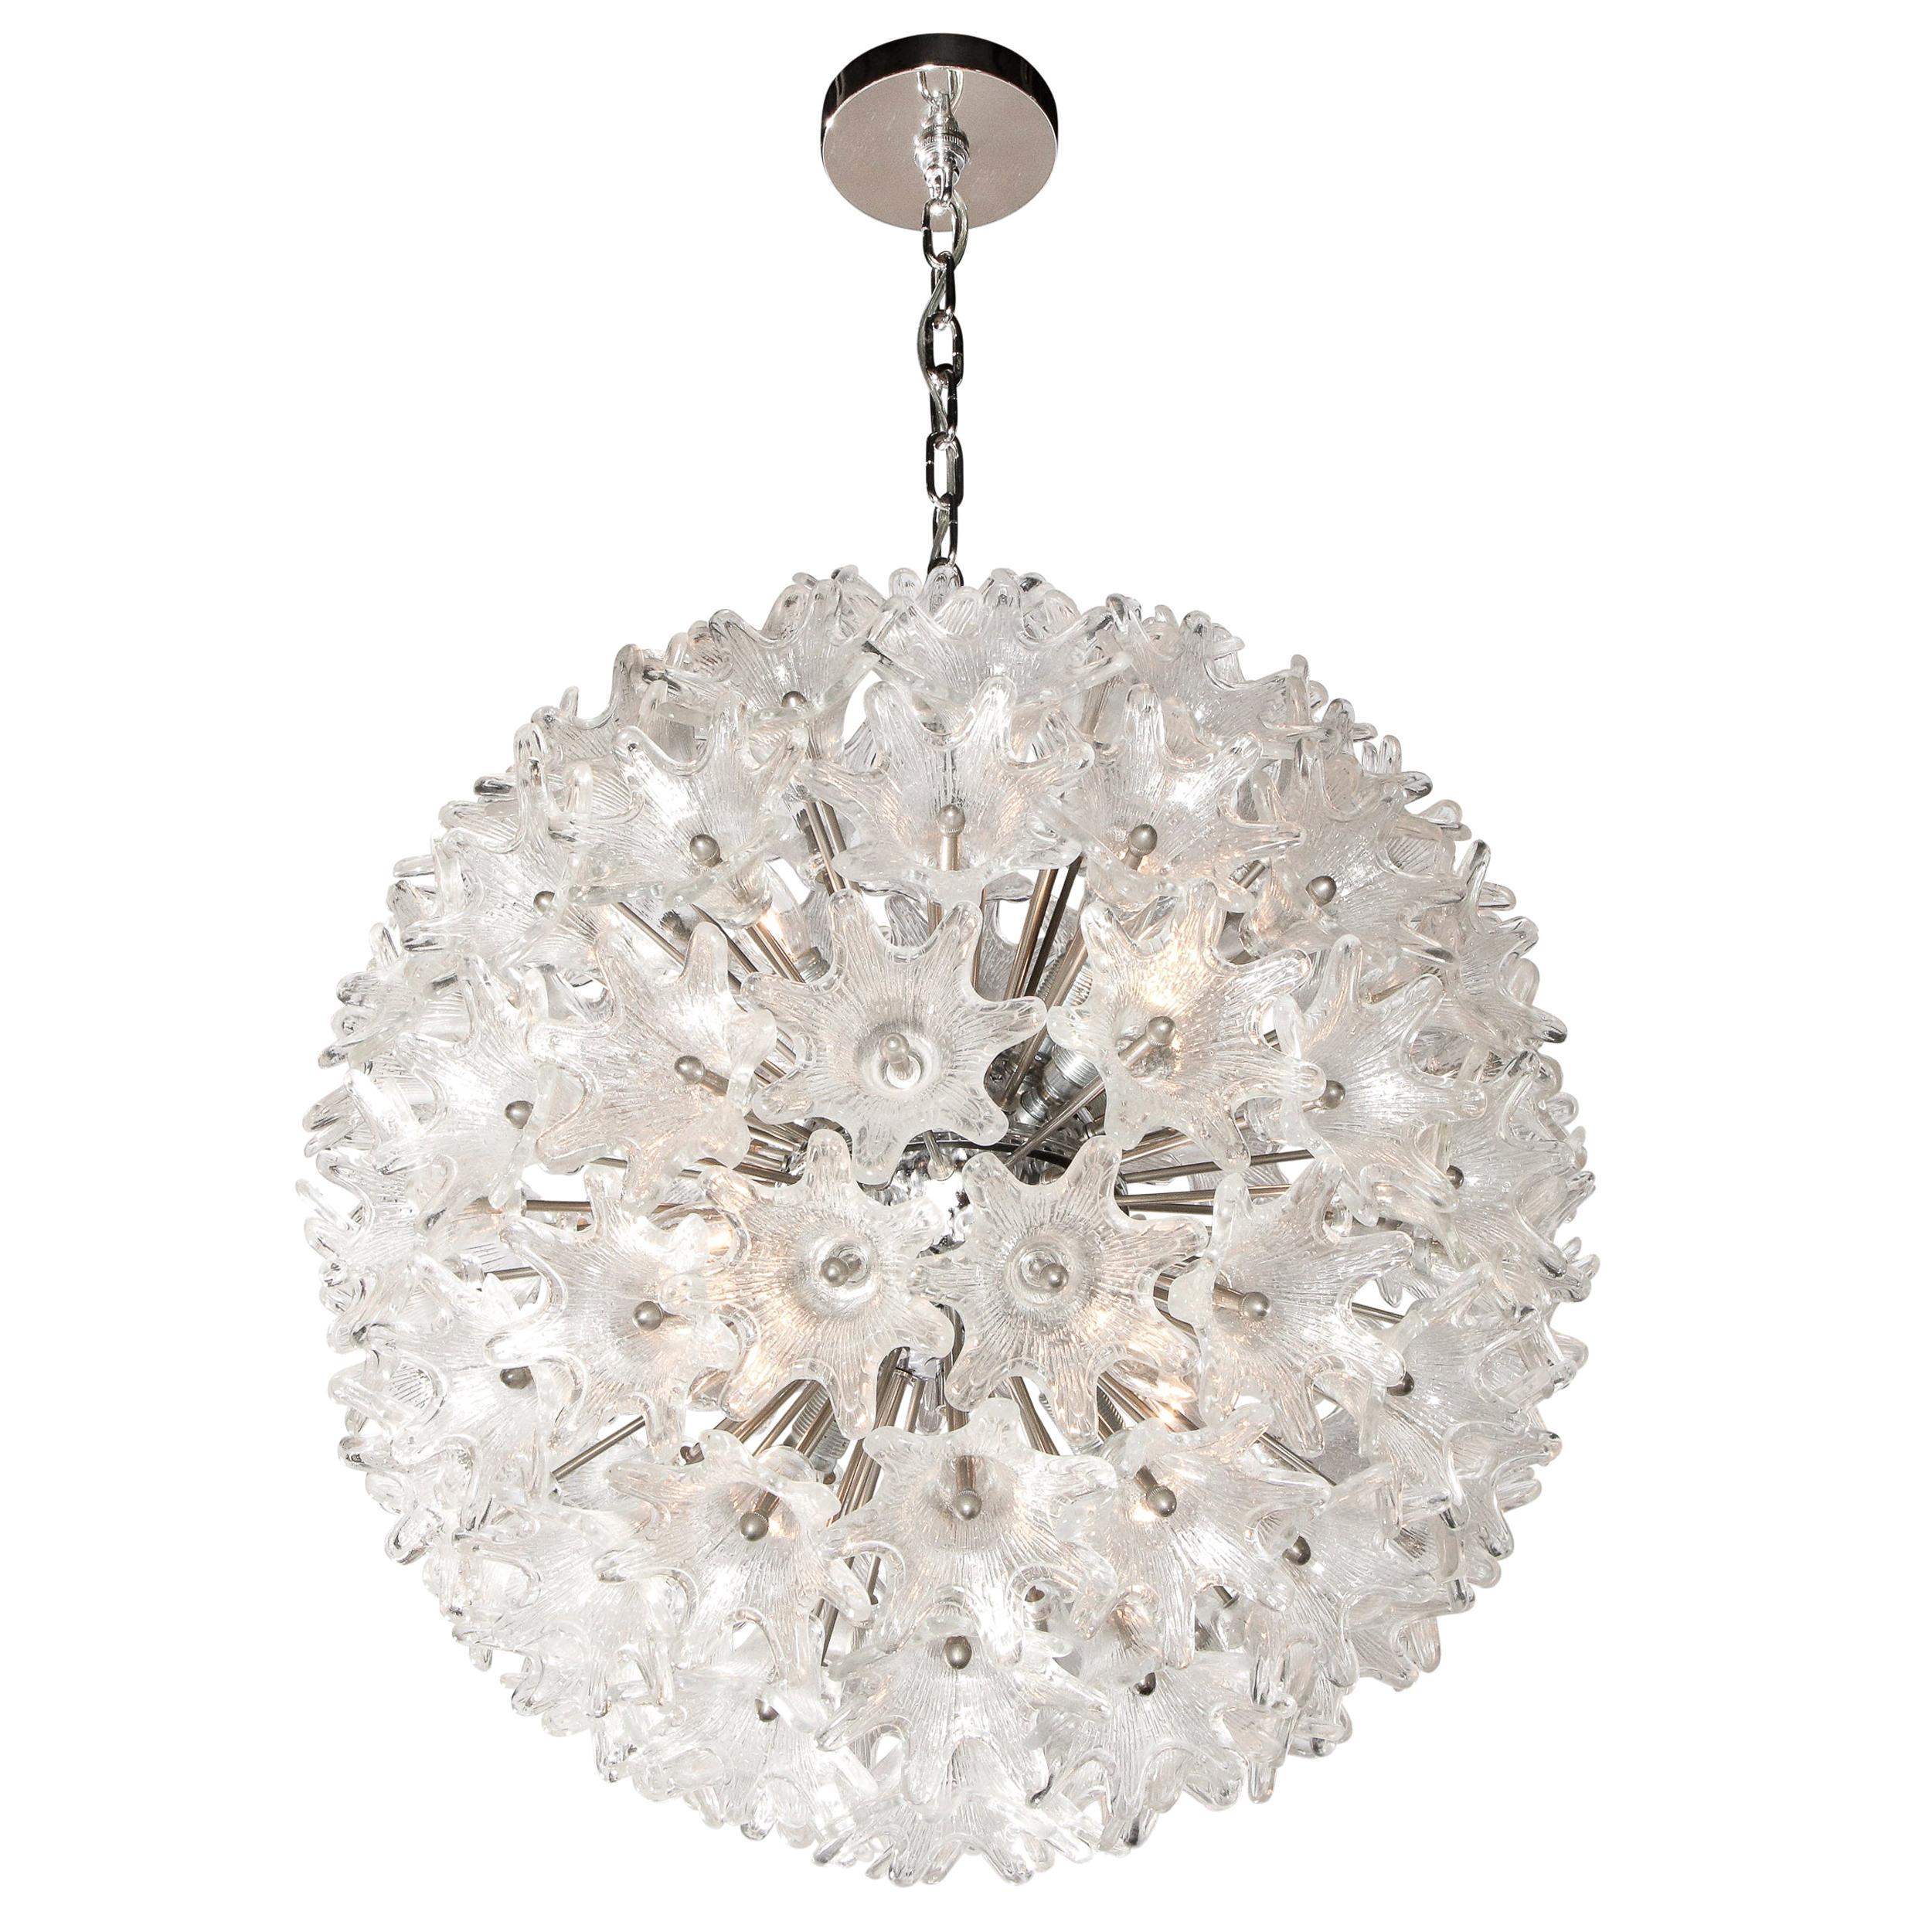 Mid-Century Modern Chrome & Murano Glass Stylized Floral Sputnik Chandelier